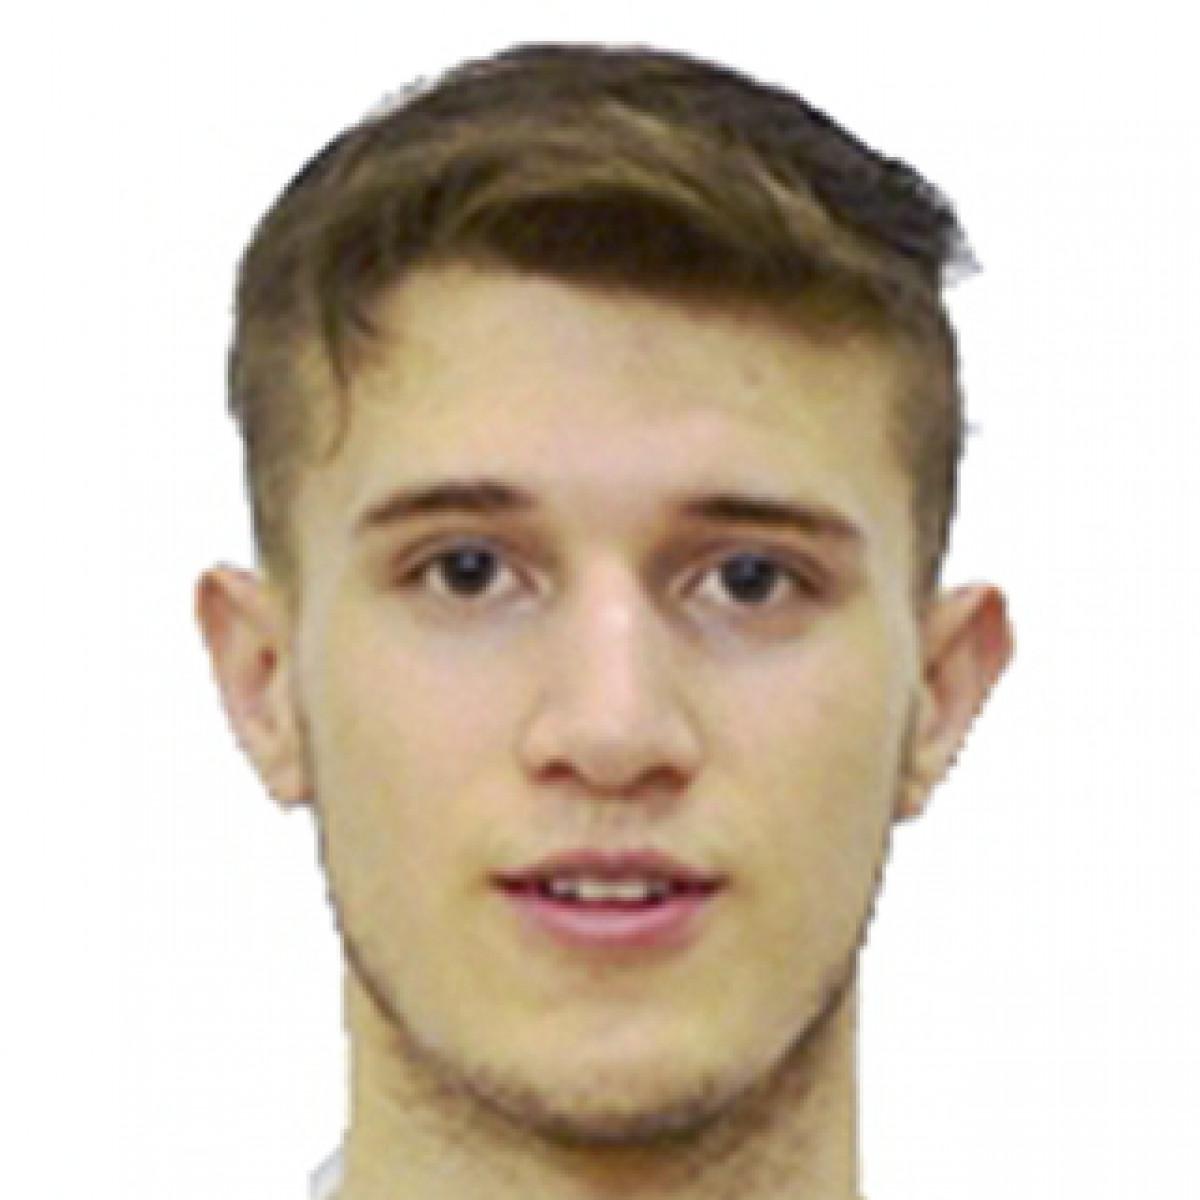 Mateo Viana